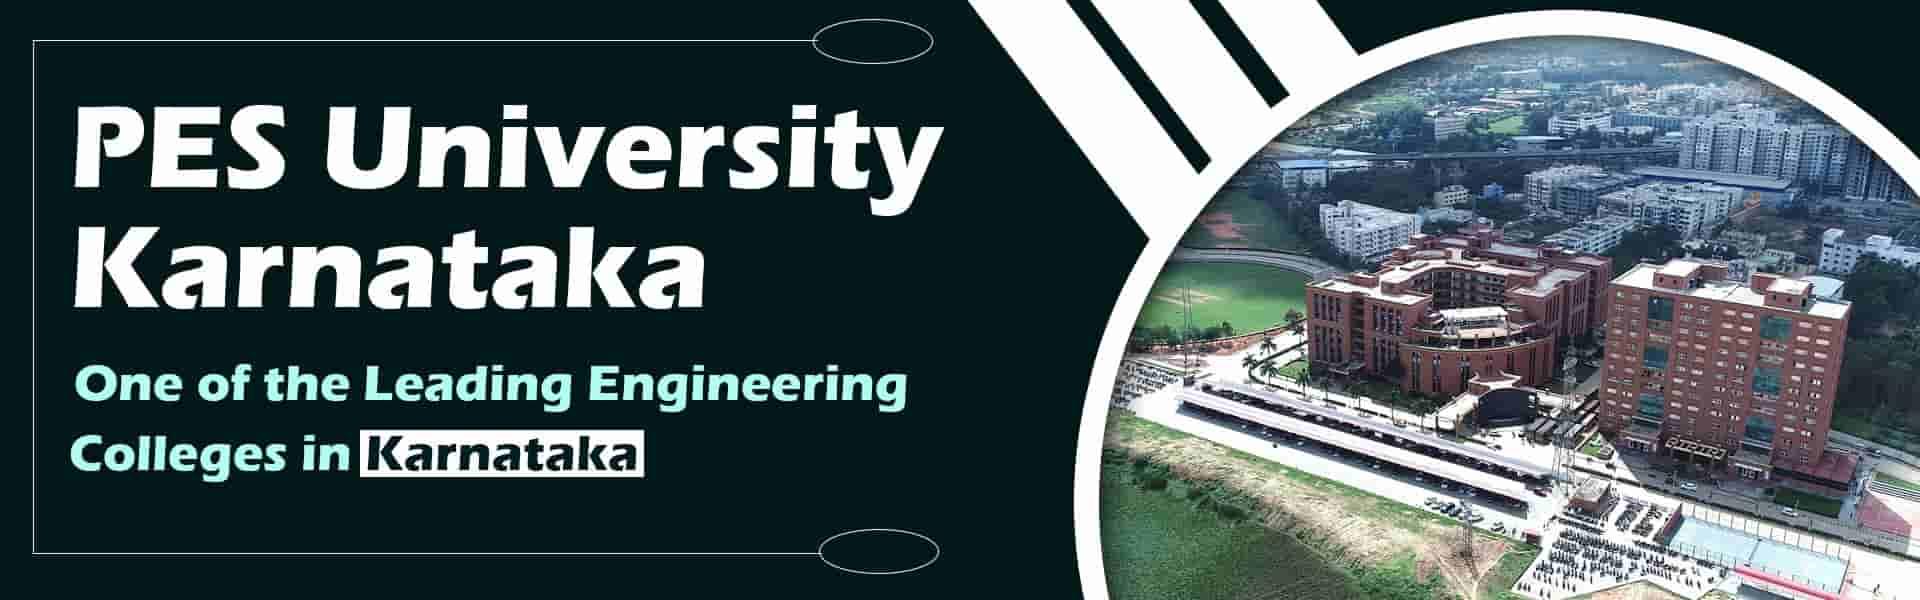 PES University Karnataka